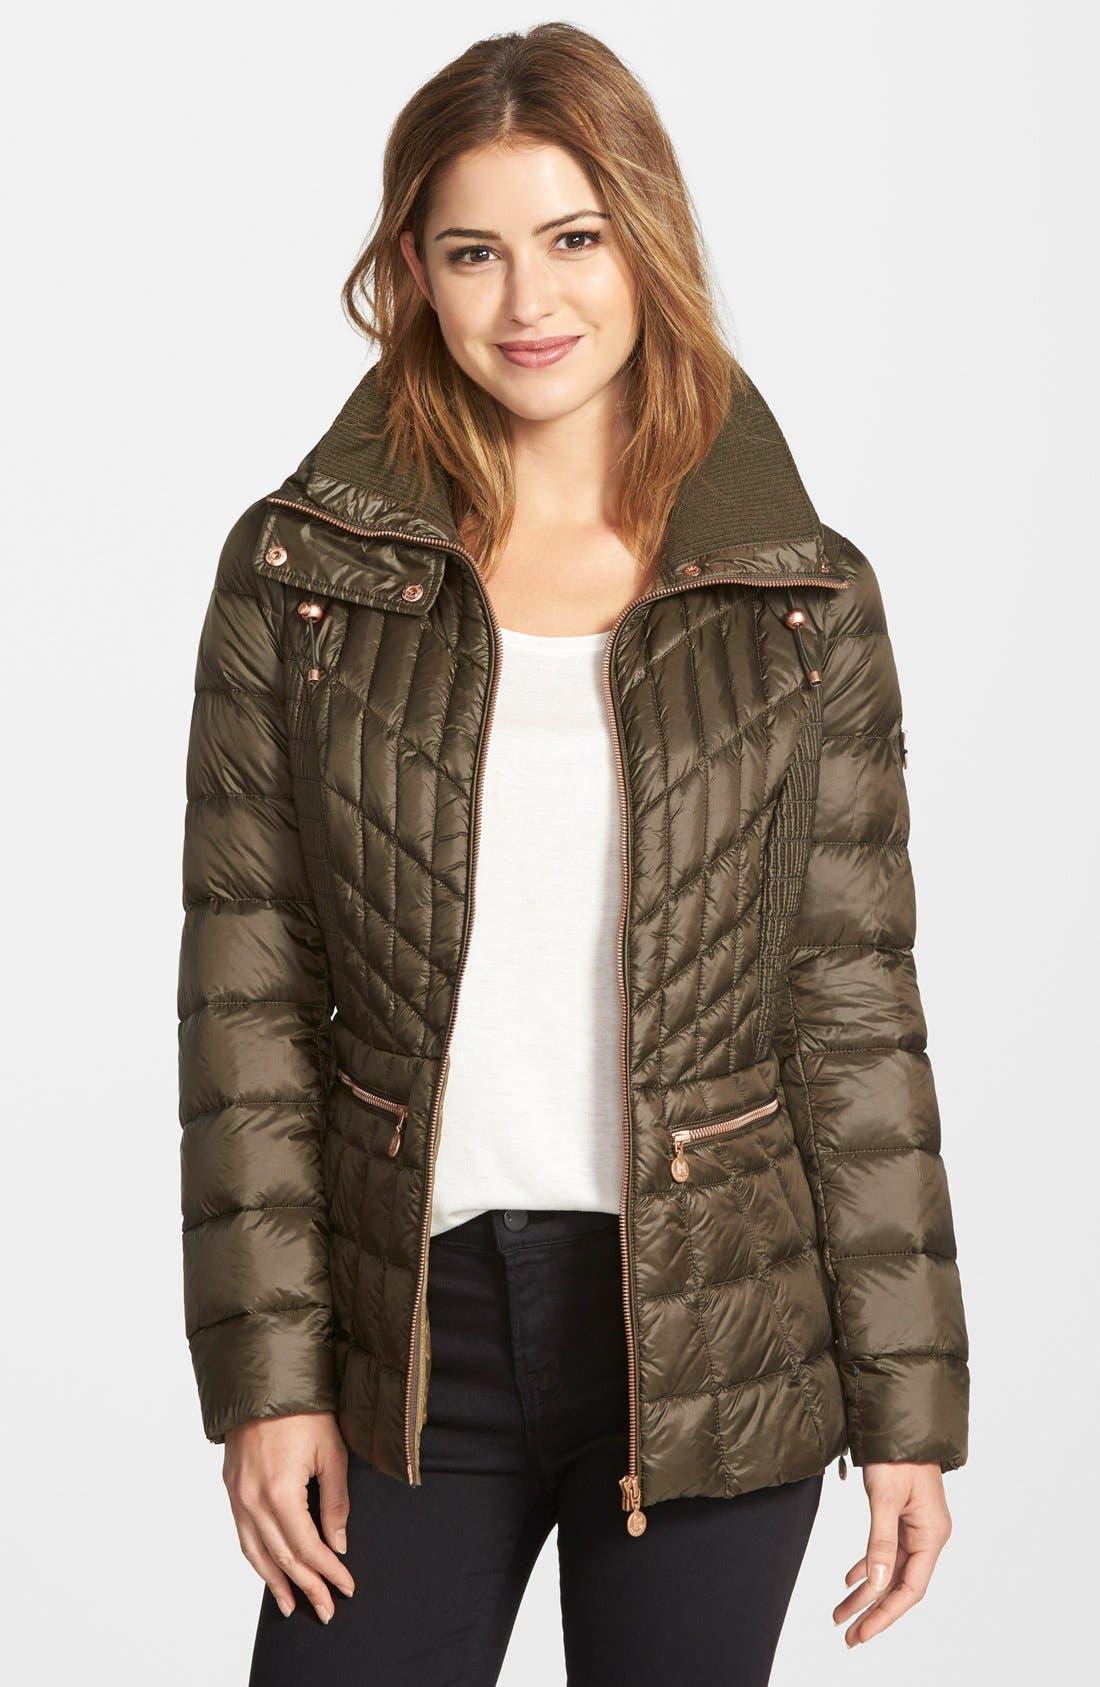 Alternate Image 1 Selected - Bernardo Packable Jacket with Down & PrimaLoft® Fill (Regular & Petite)